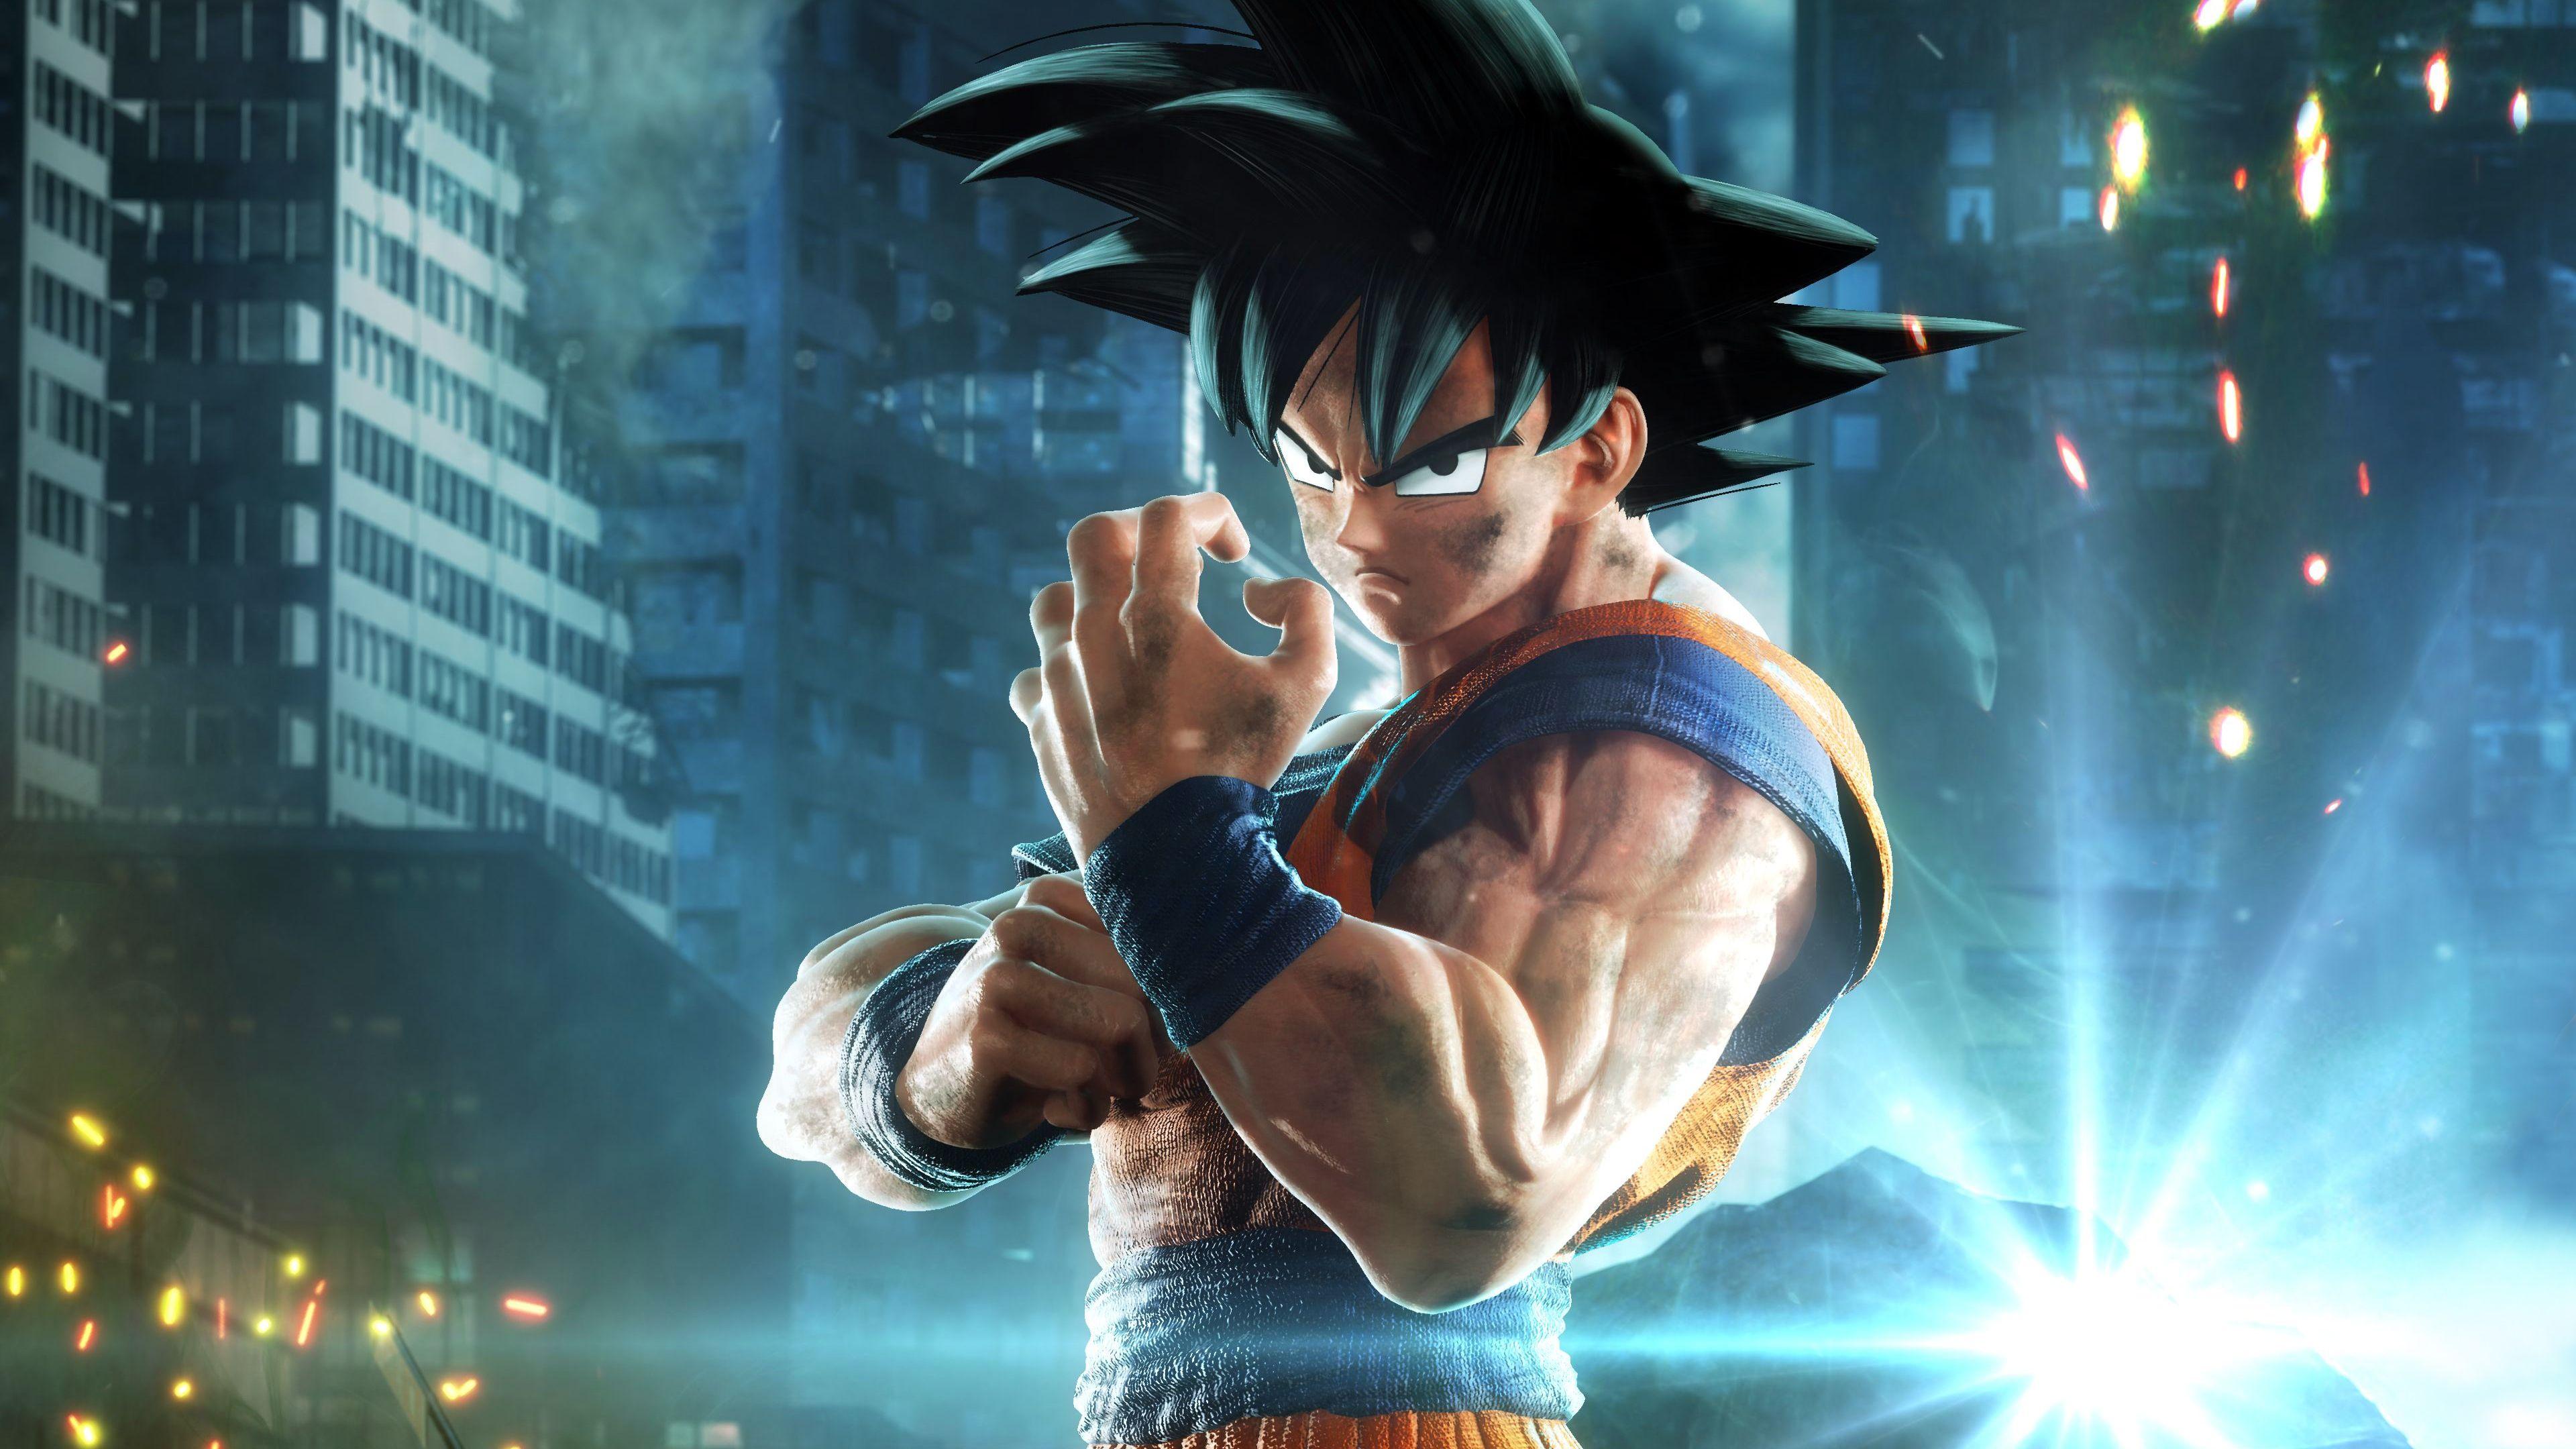 Imagen Relacionada Goku Wallpaper Goku Dragon Ball Super Wallpapers